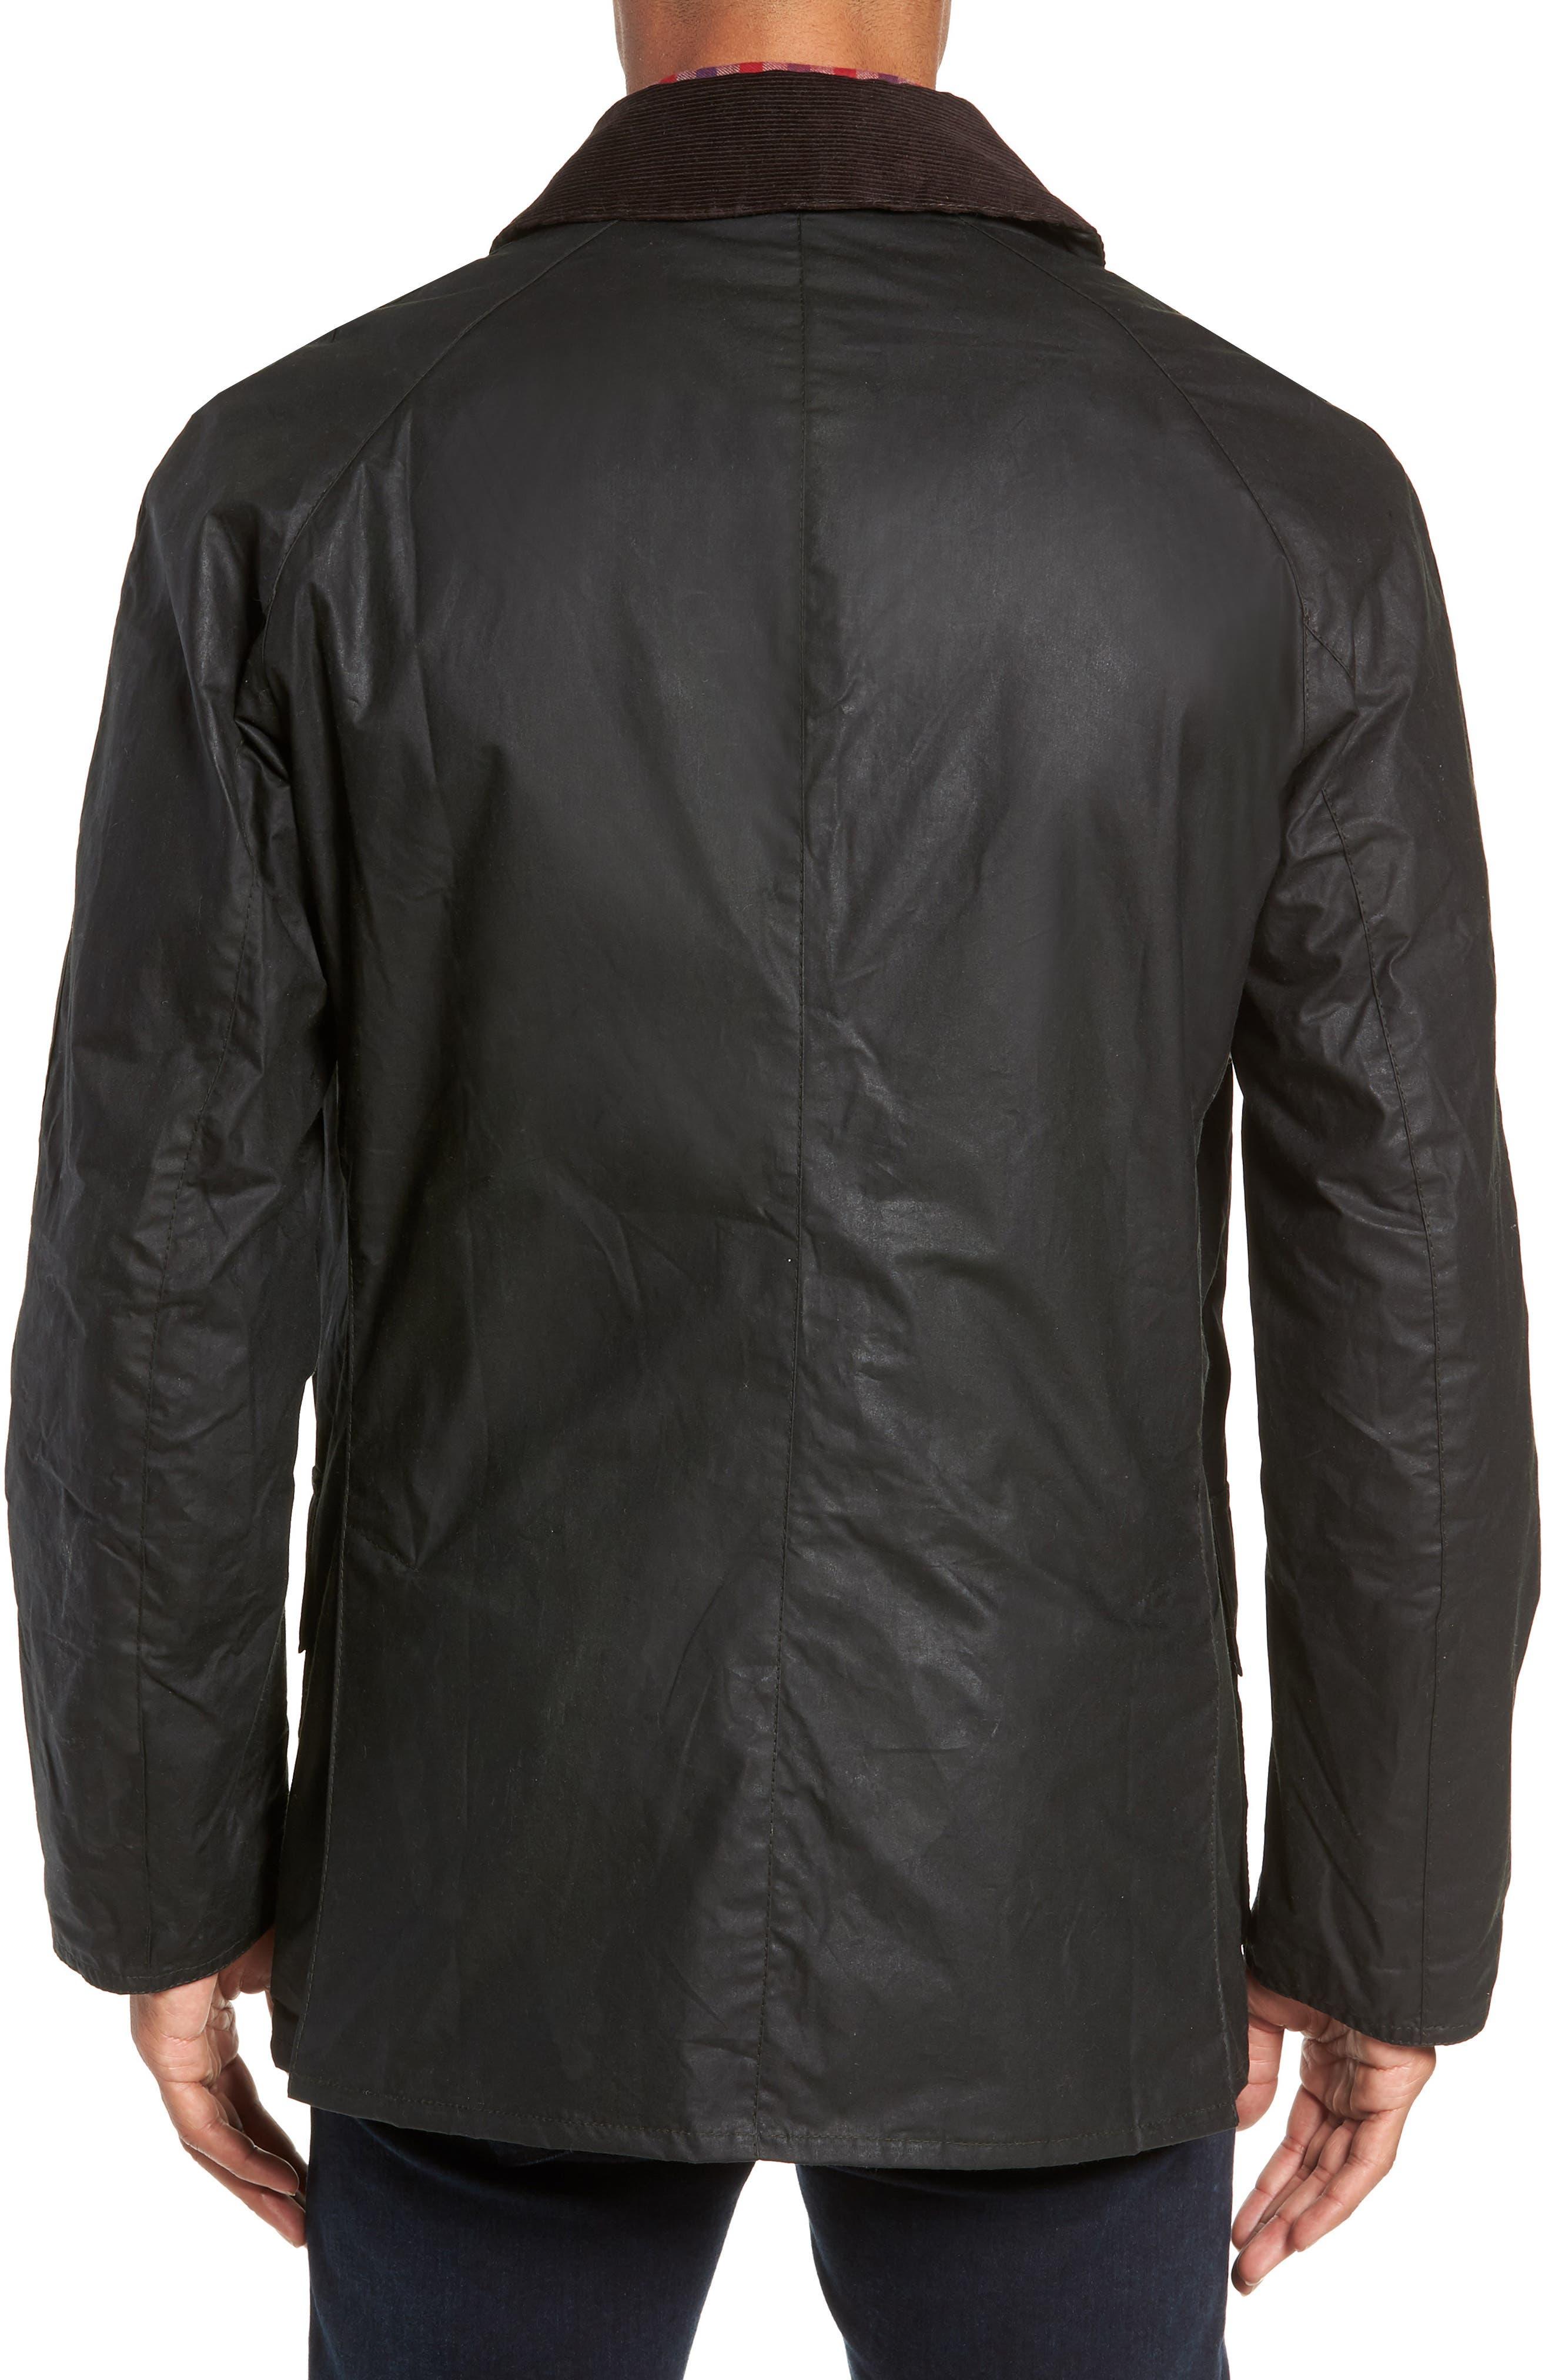 Lightweight Ashby Wax Jacket,                             Alternate thumbnail 2, color,                             SAGE